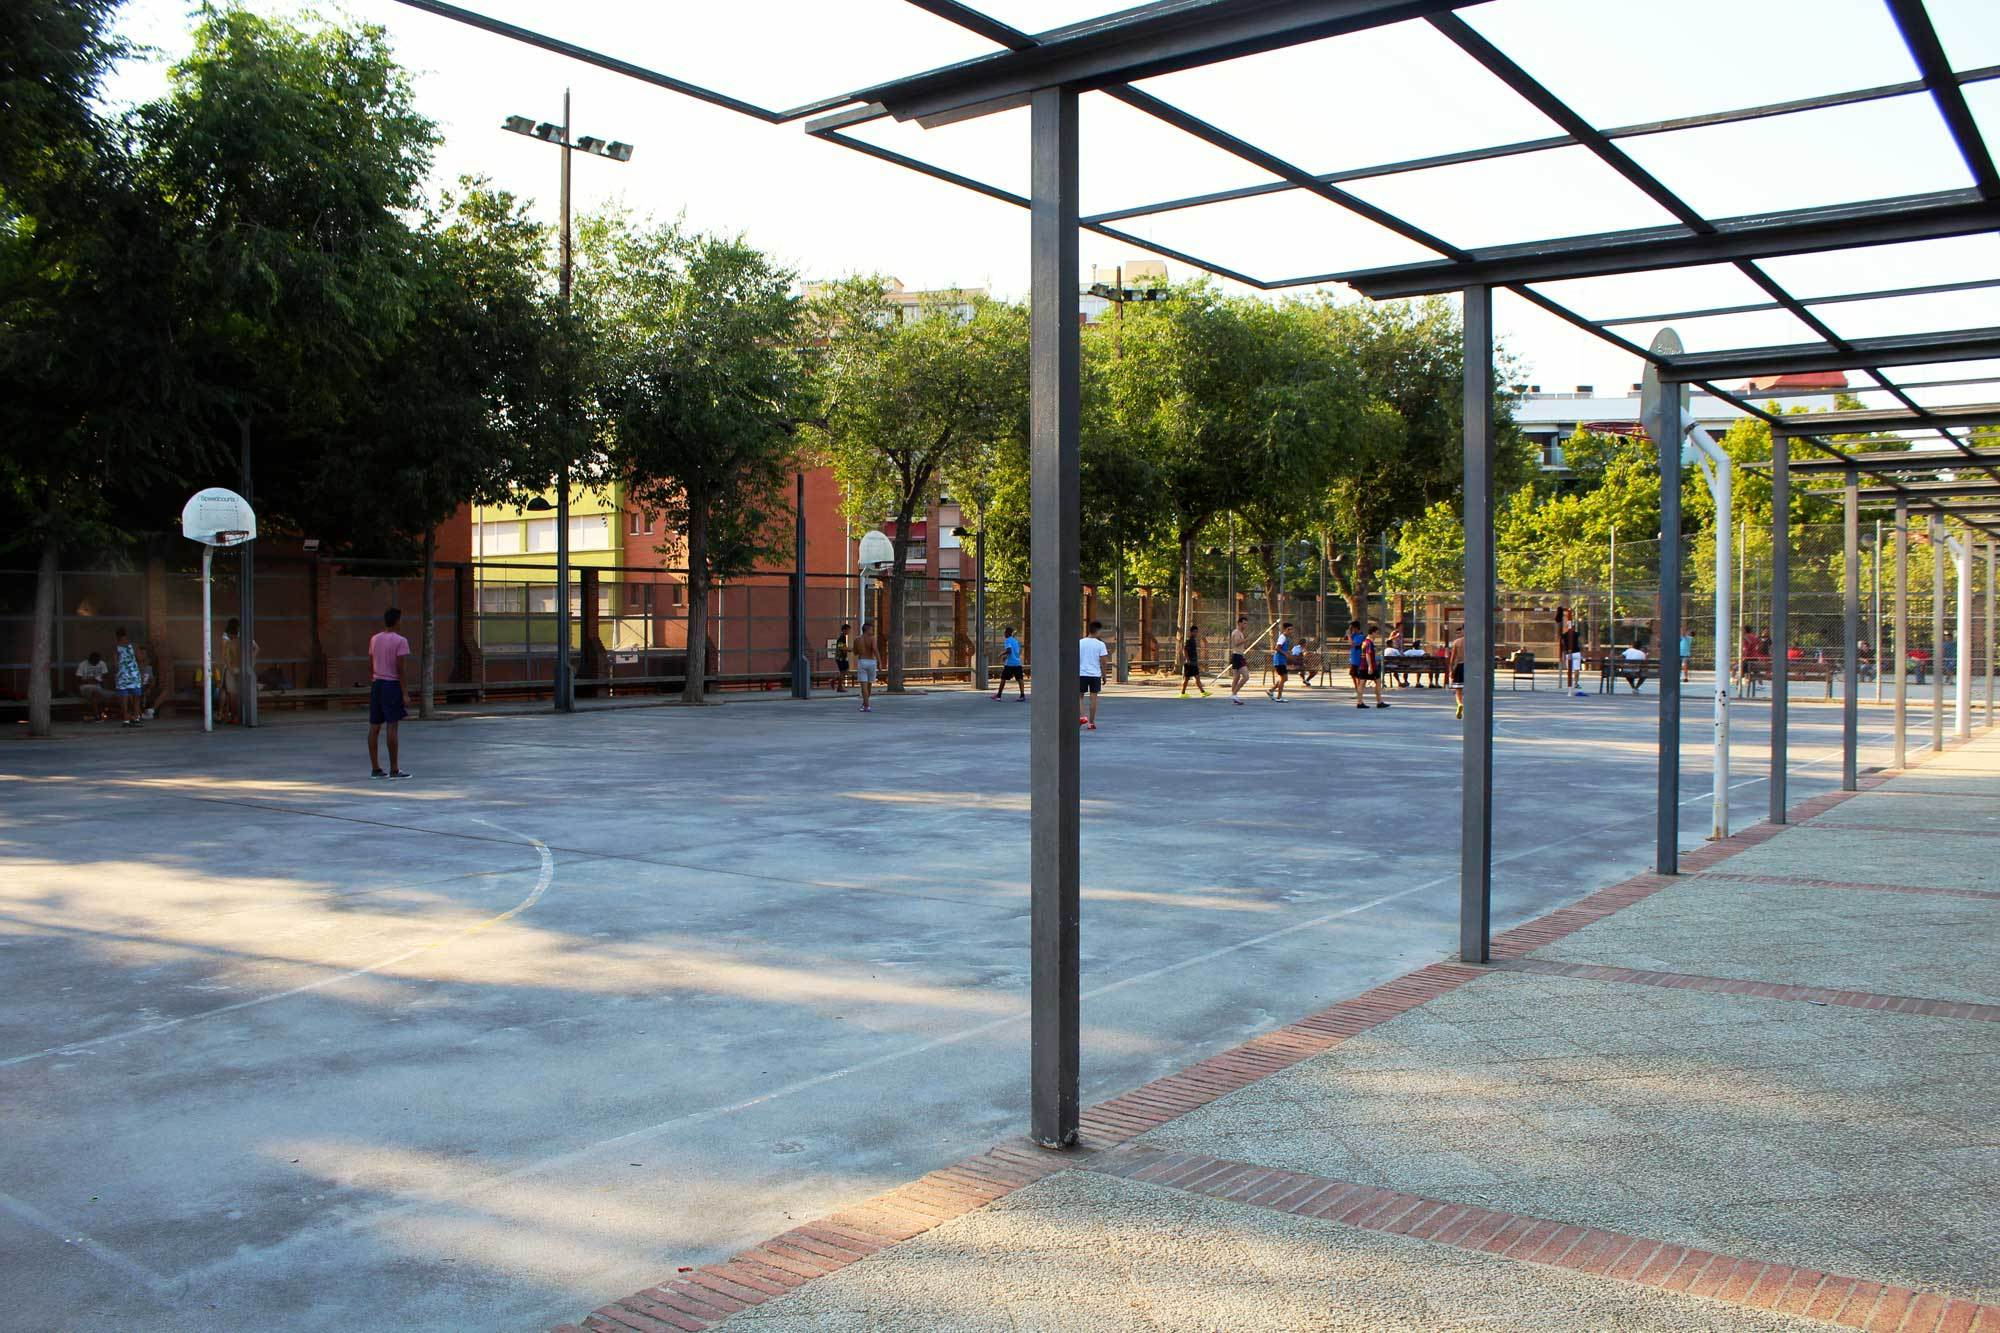 Pista poliesportiva Parc de la Pegaso